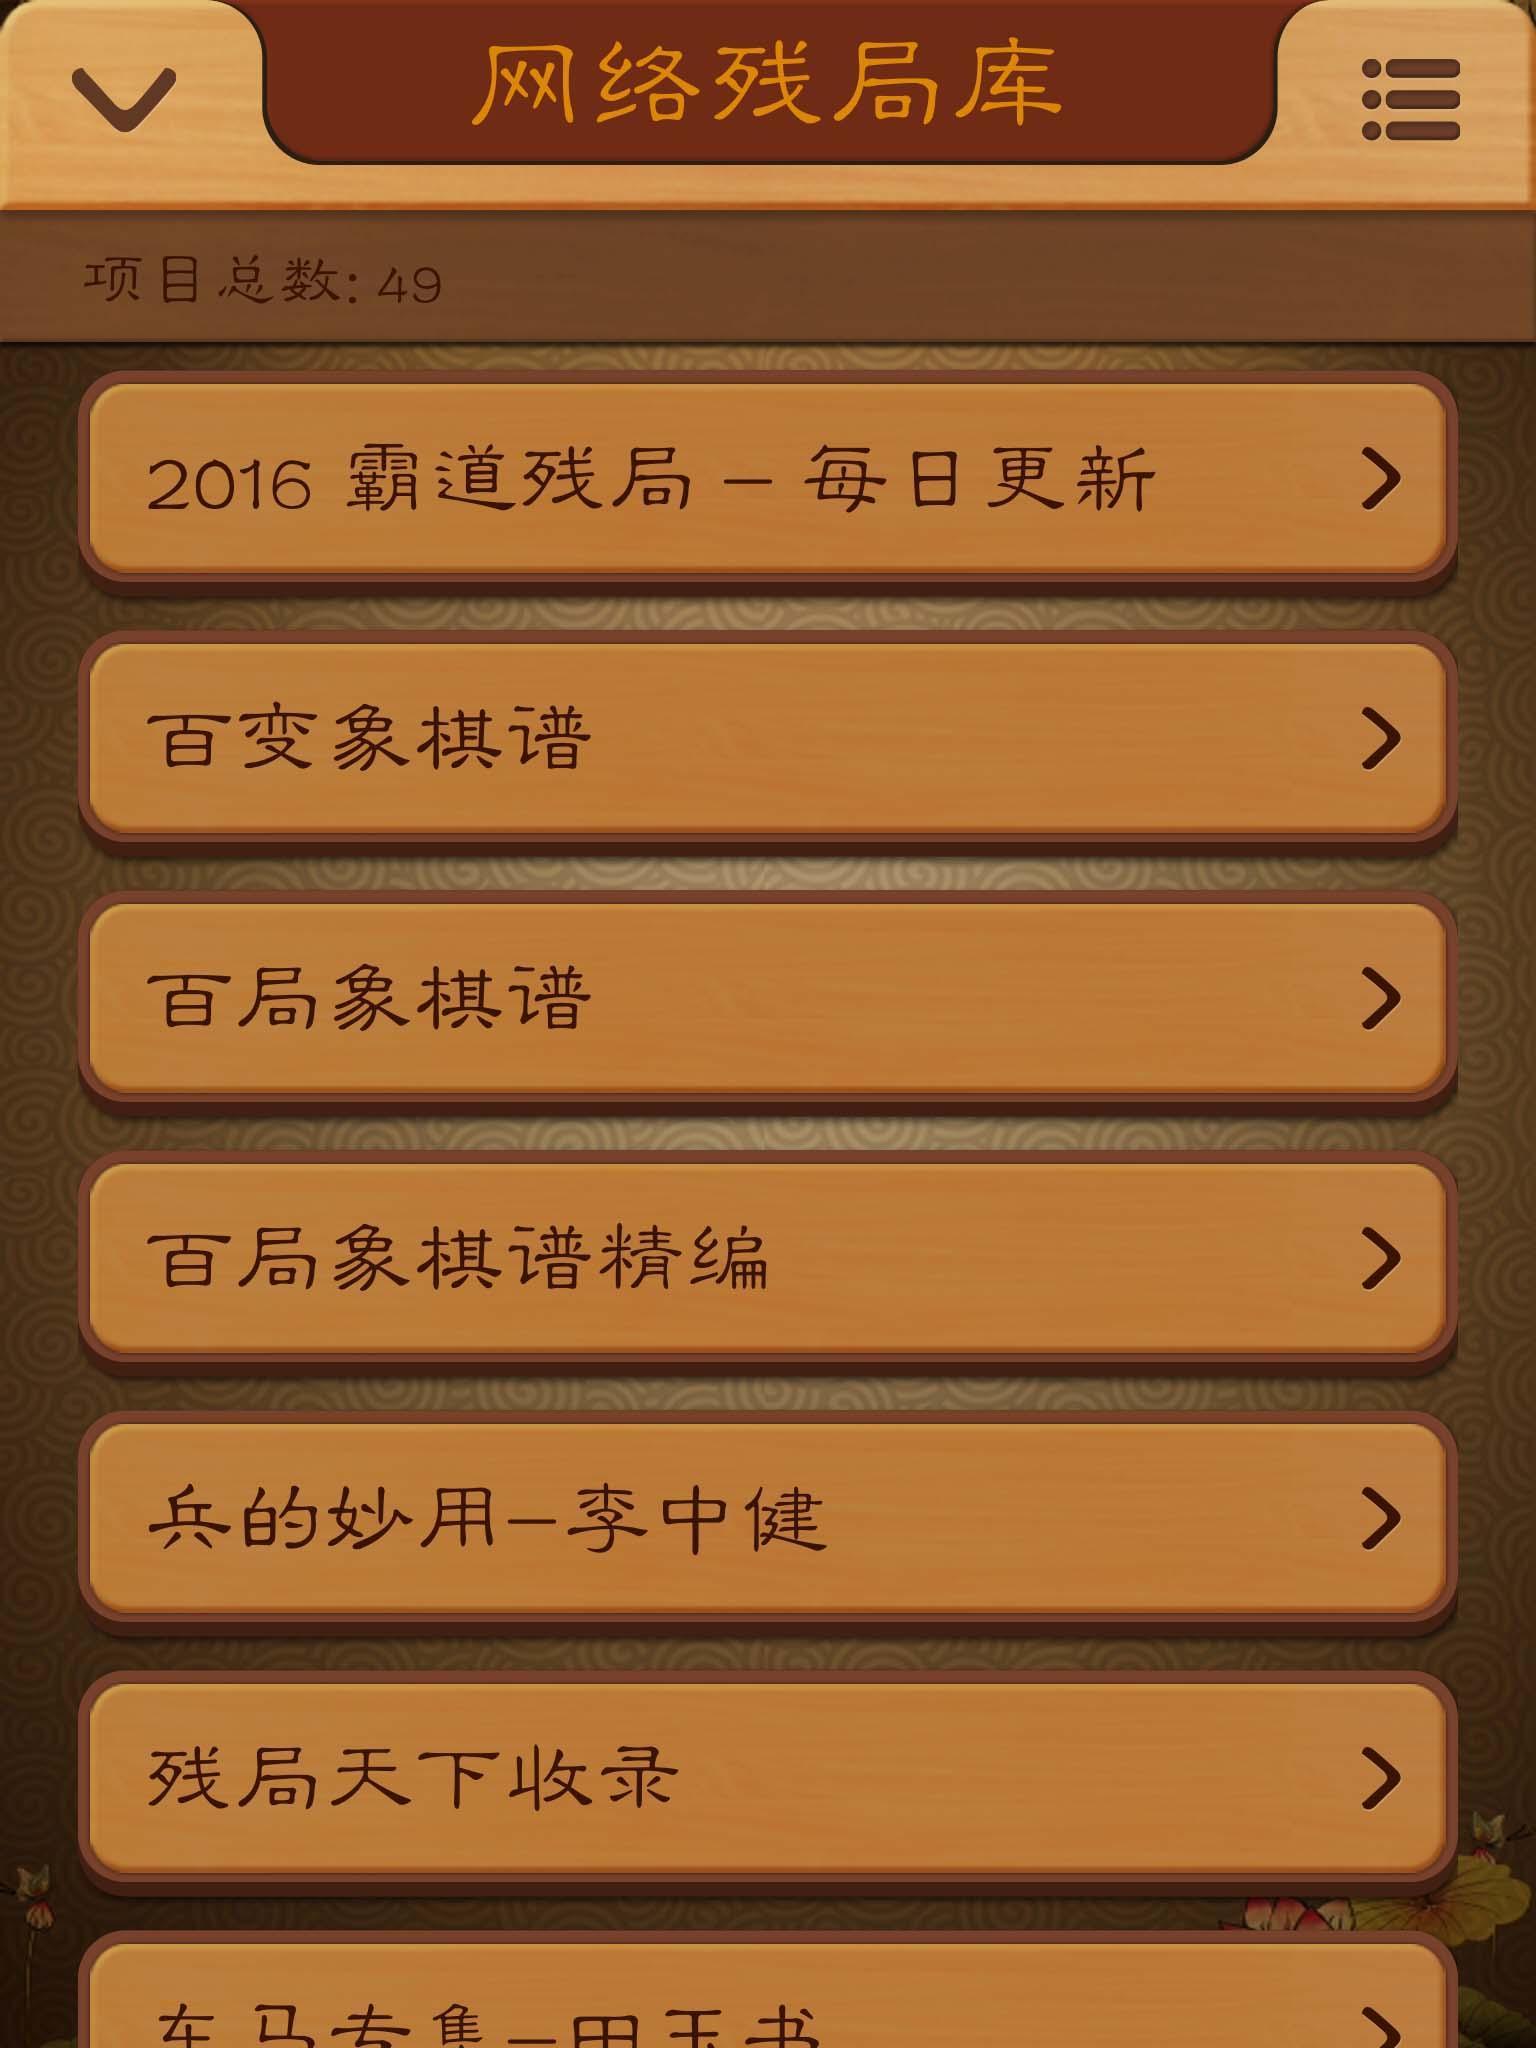 Chinese Chess, Xiangqi - many endgame and replay 3.9.6 Screenshot 14